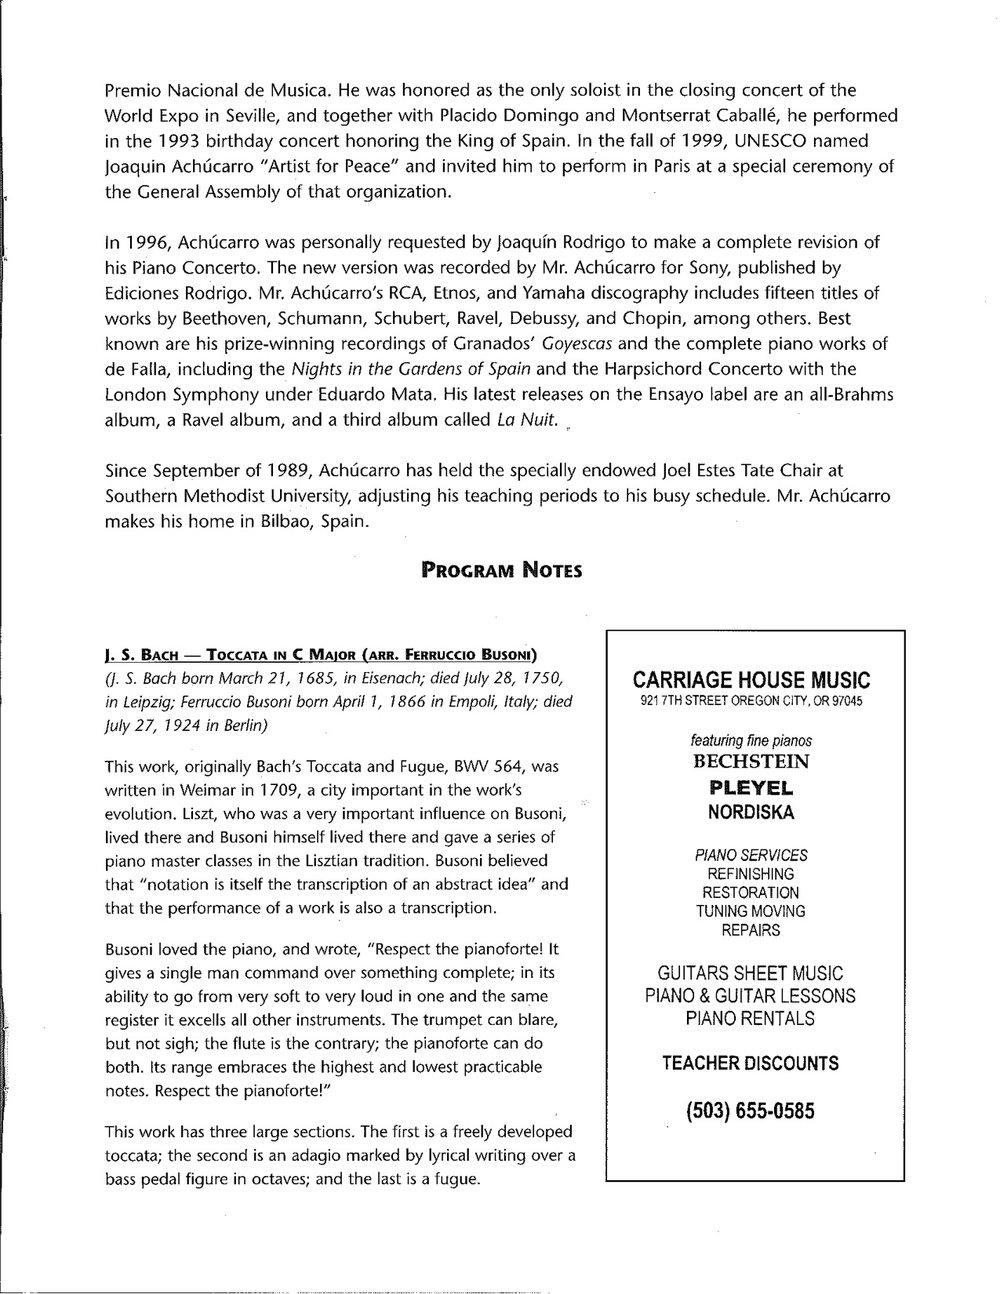 Achucarro02-03_Program4.jpg